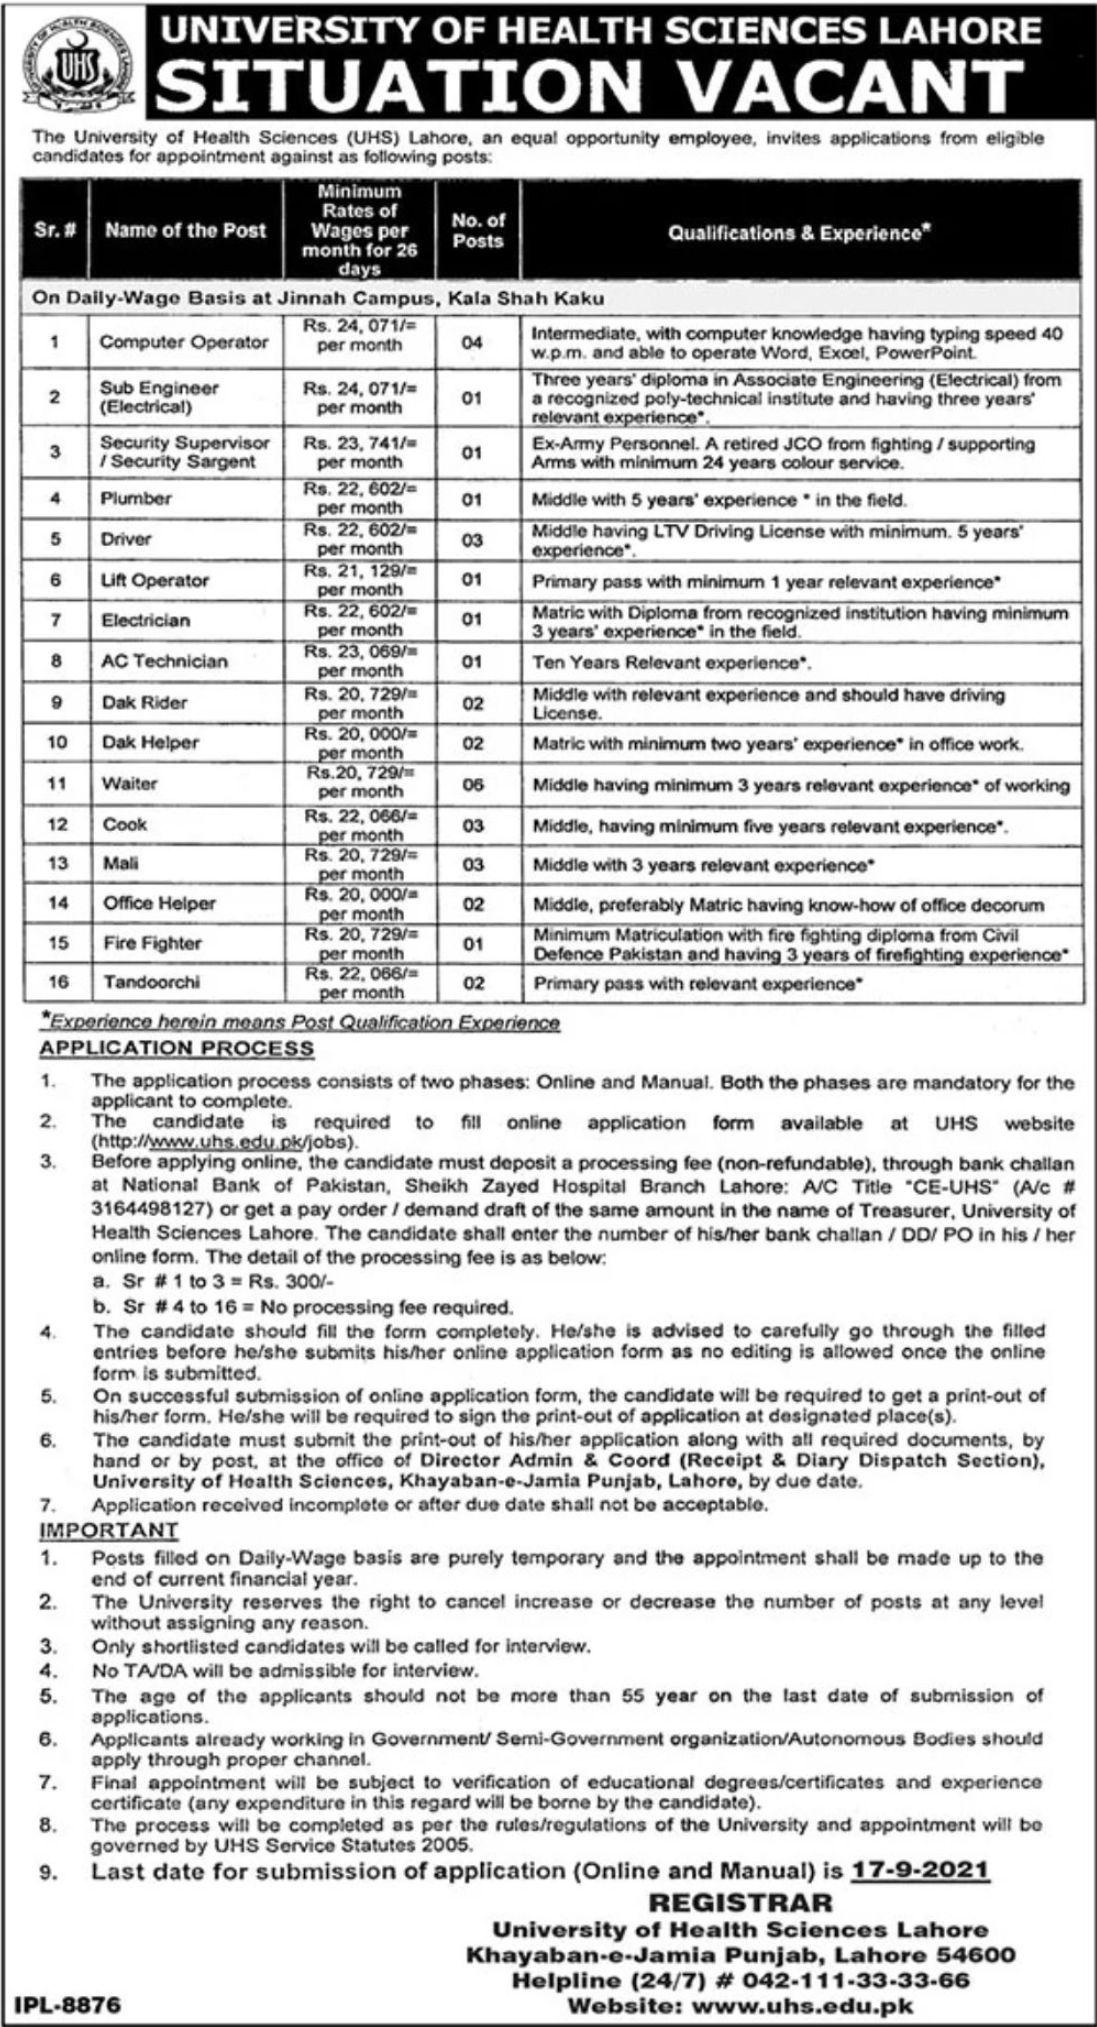 University of Health Sciences UHS Lahore Vacancies 2021 3